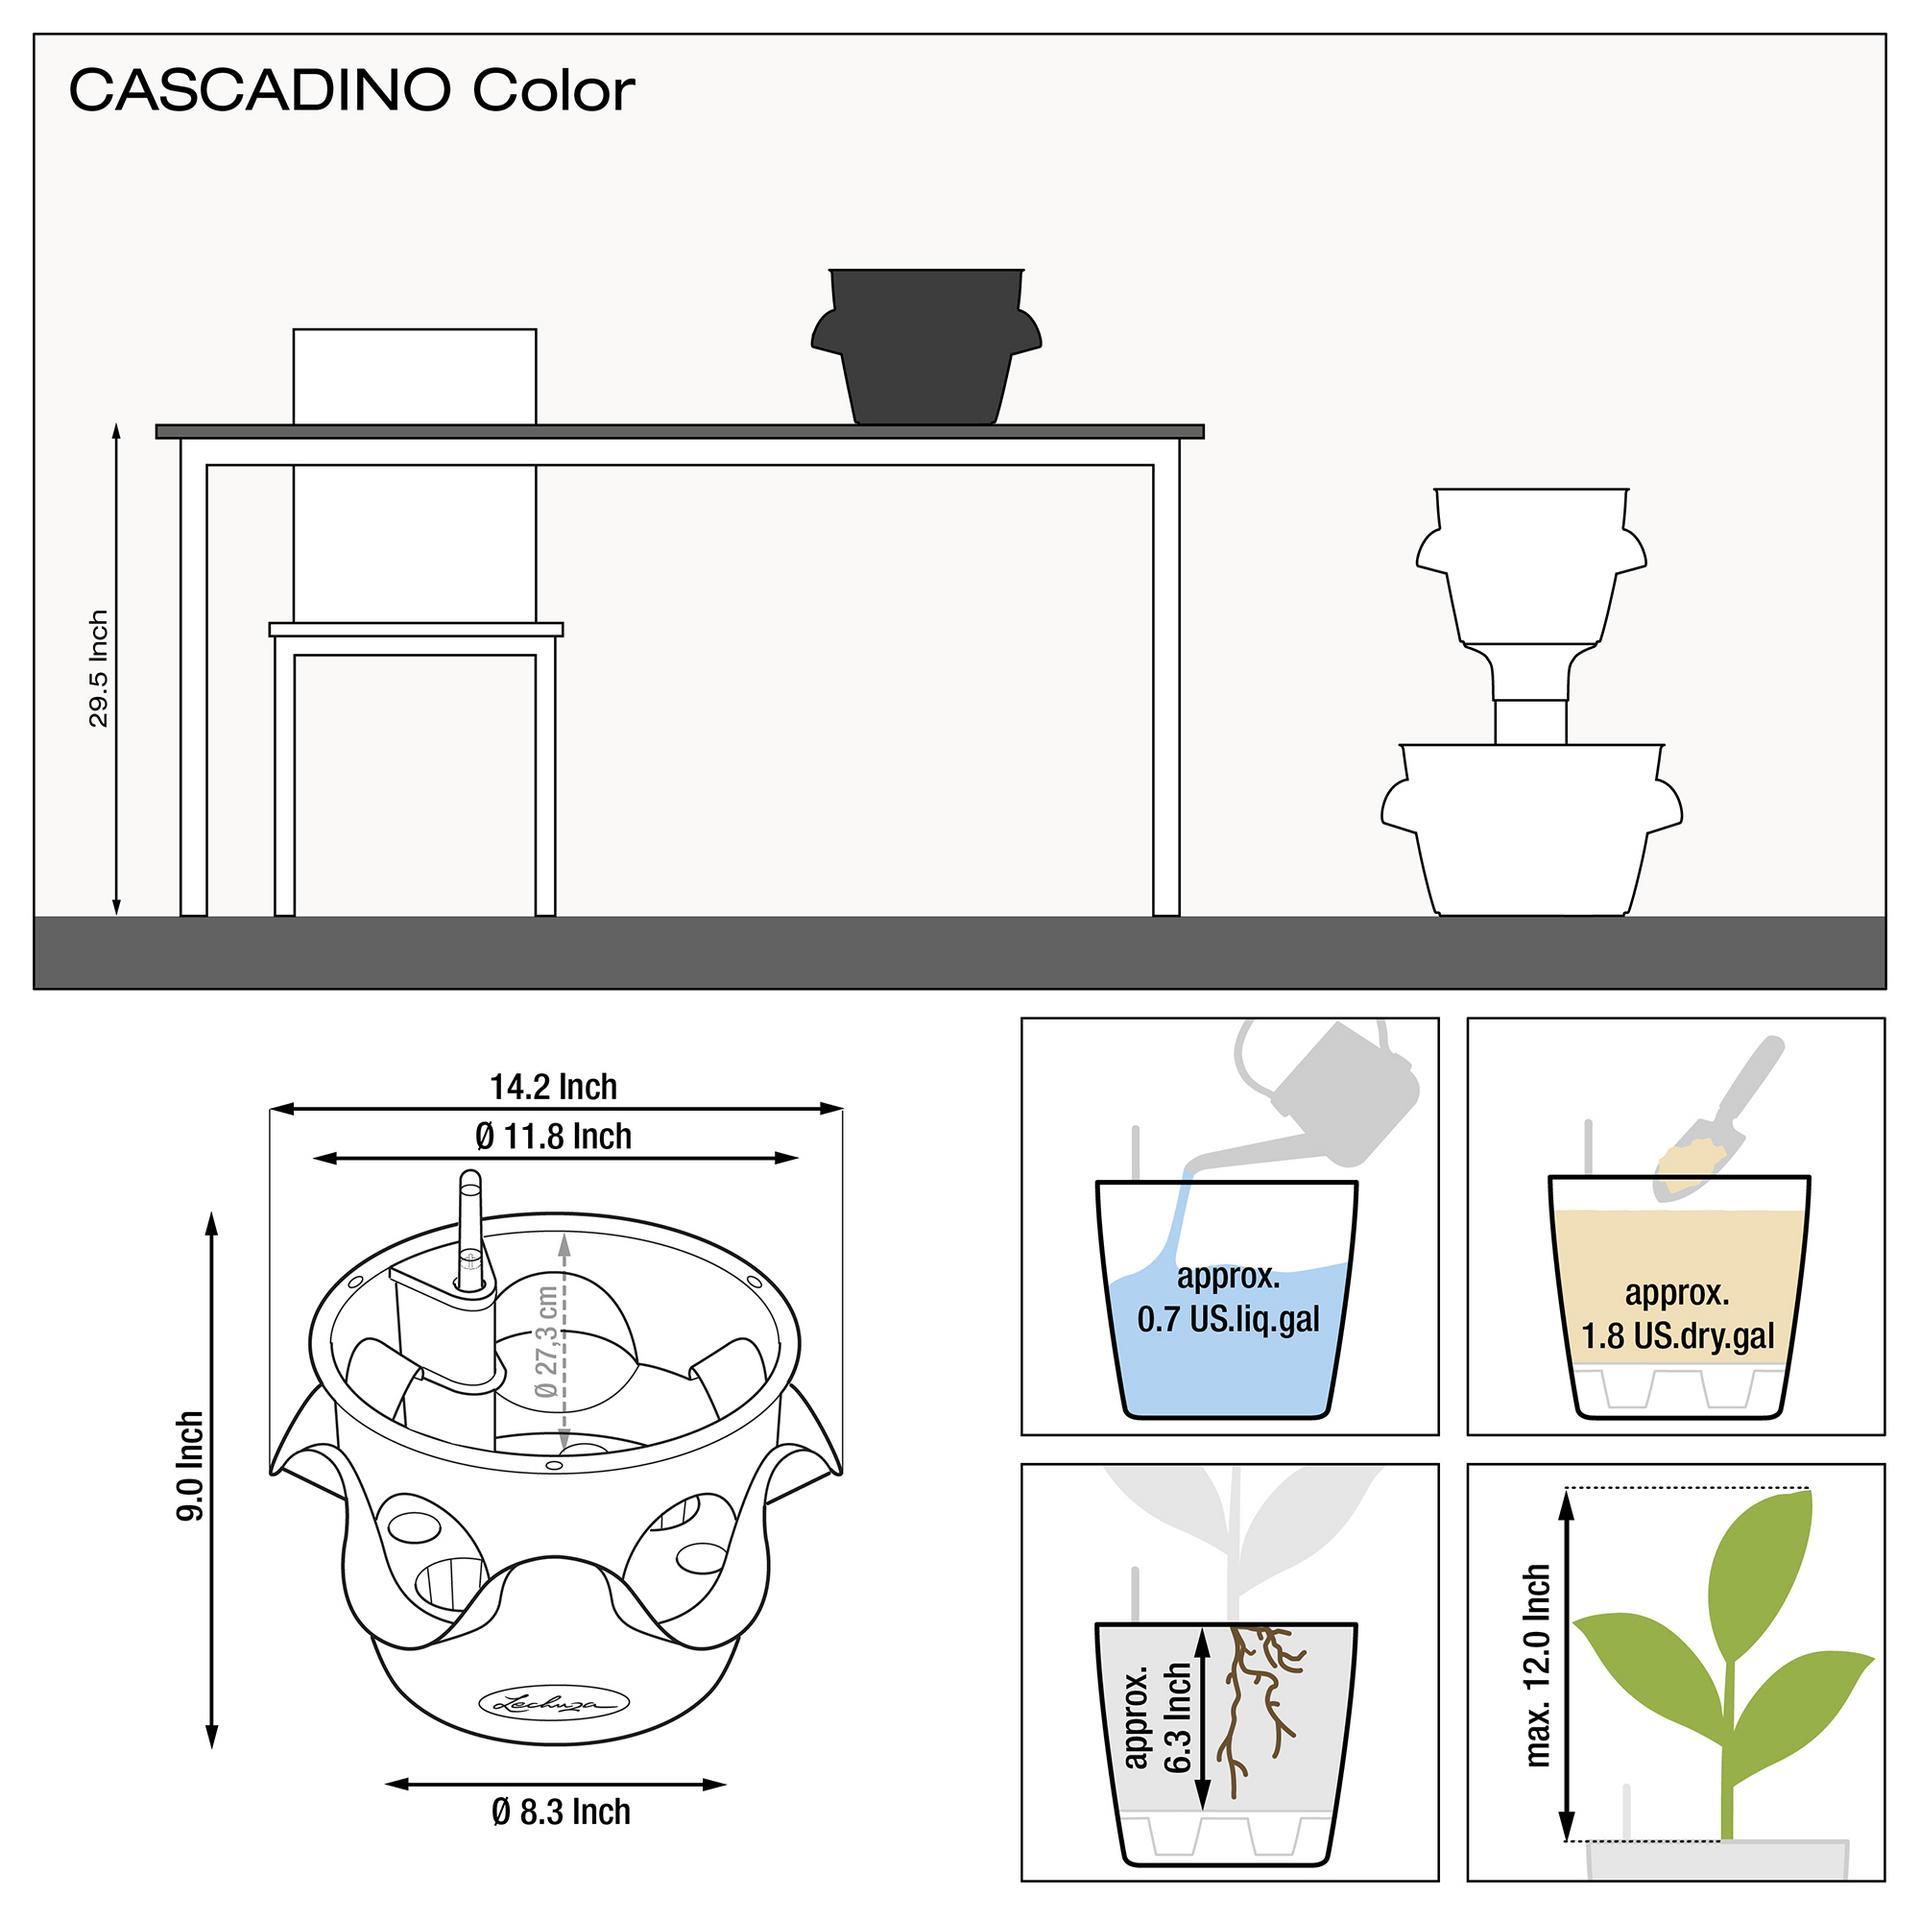 le_cascadino-color36_product_addi_nz_us